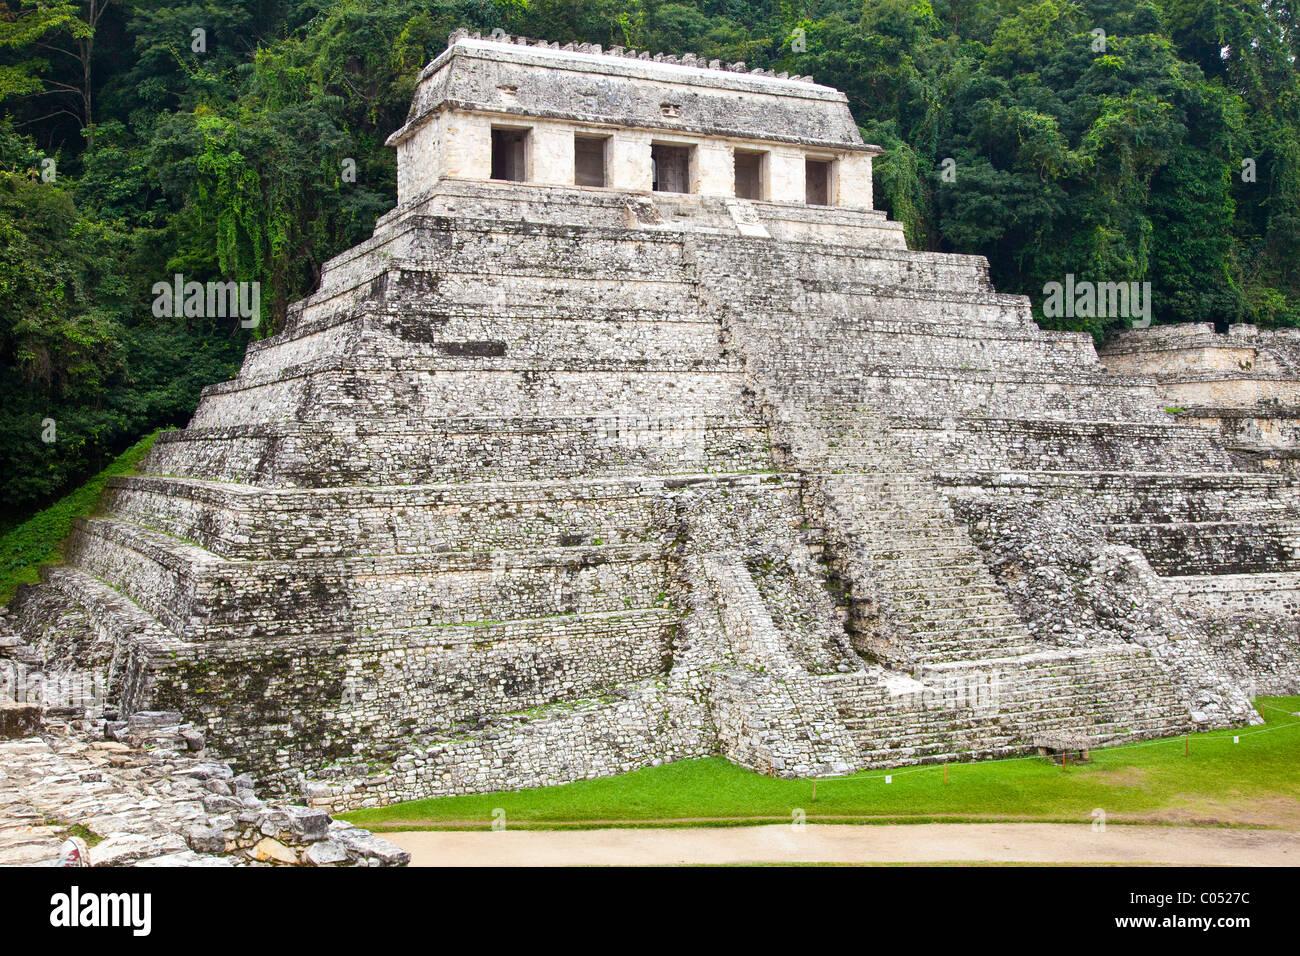 Temple of Inscriptions or Templo de Inscripciones, Palenque, Chiapas, Mexico - Stock Image